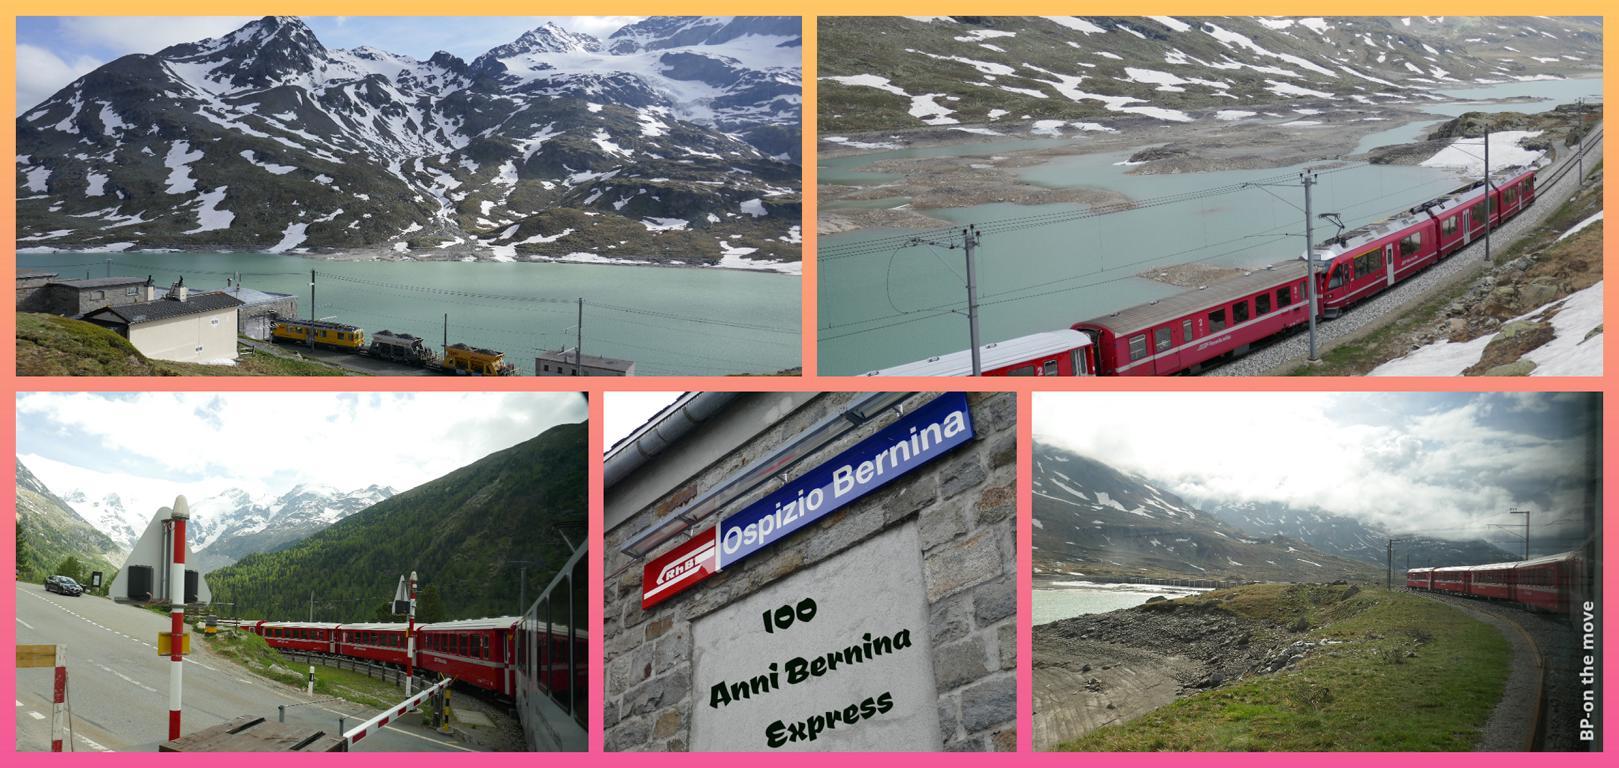 100 Anni Bernina Express